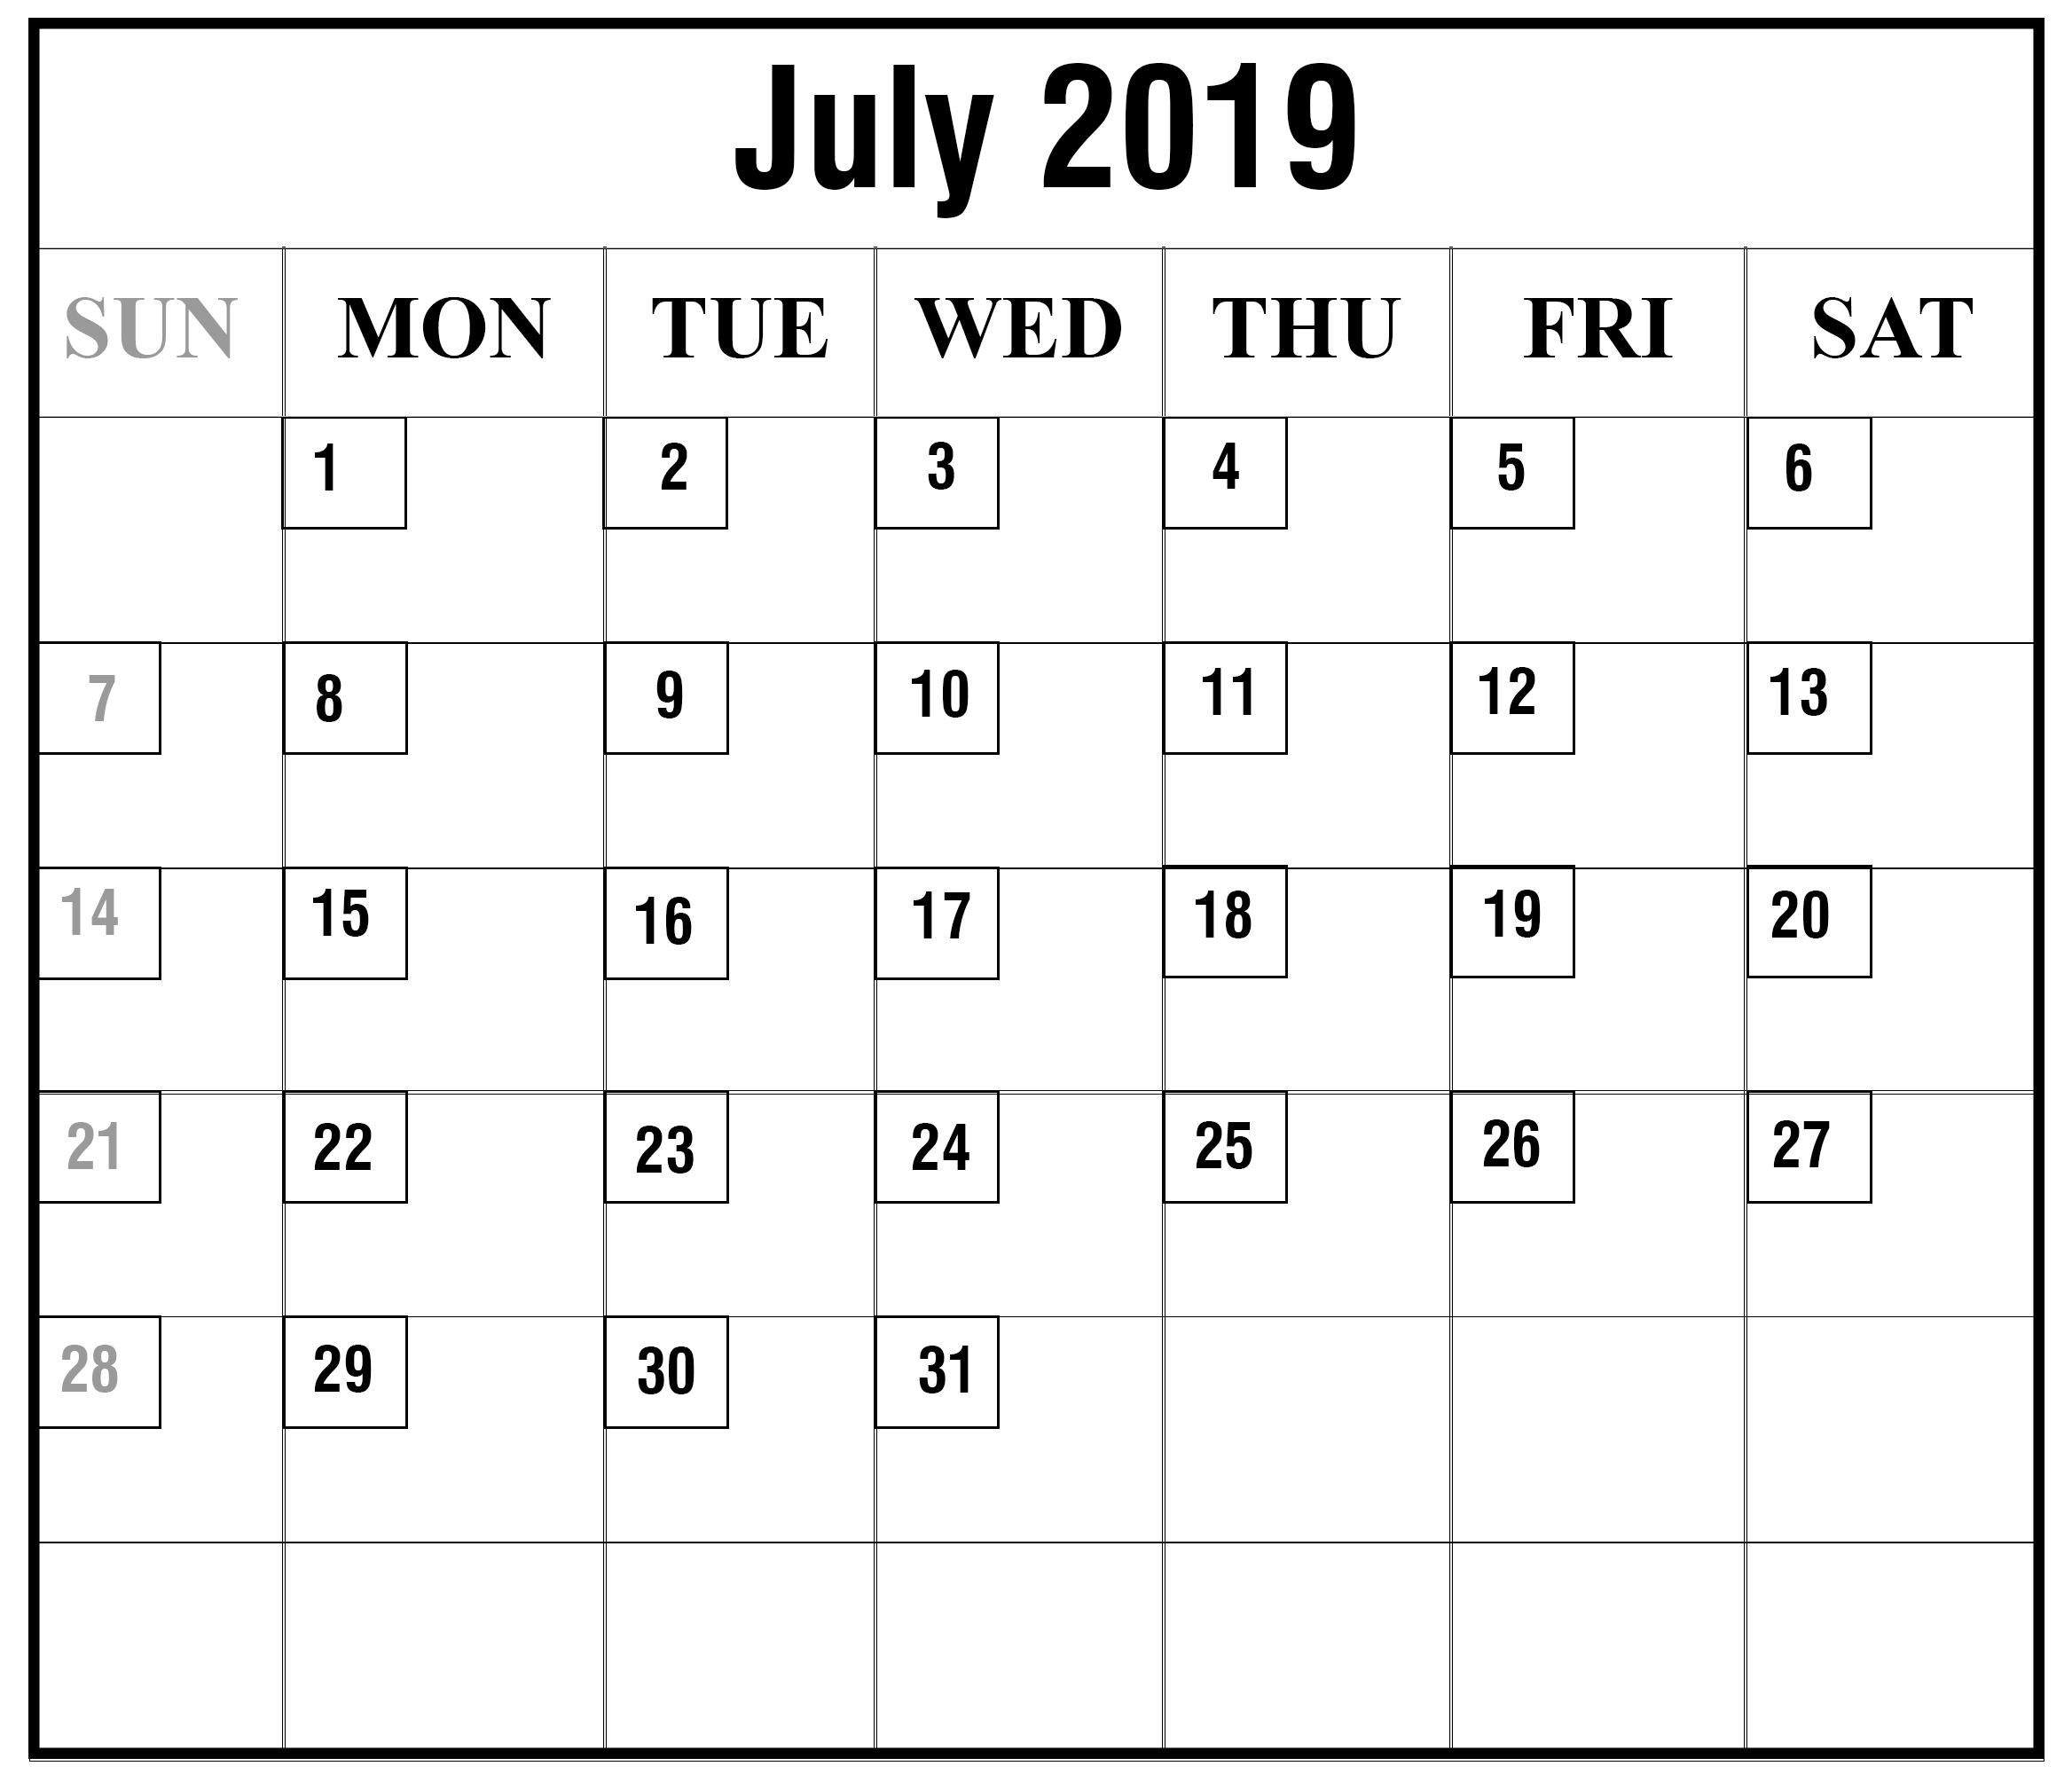 Editable July 2019 Calendar Template - Free Printable Calendar